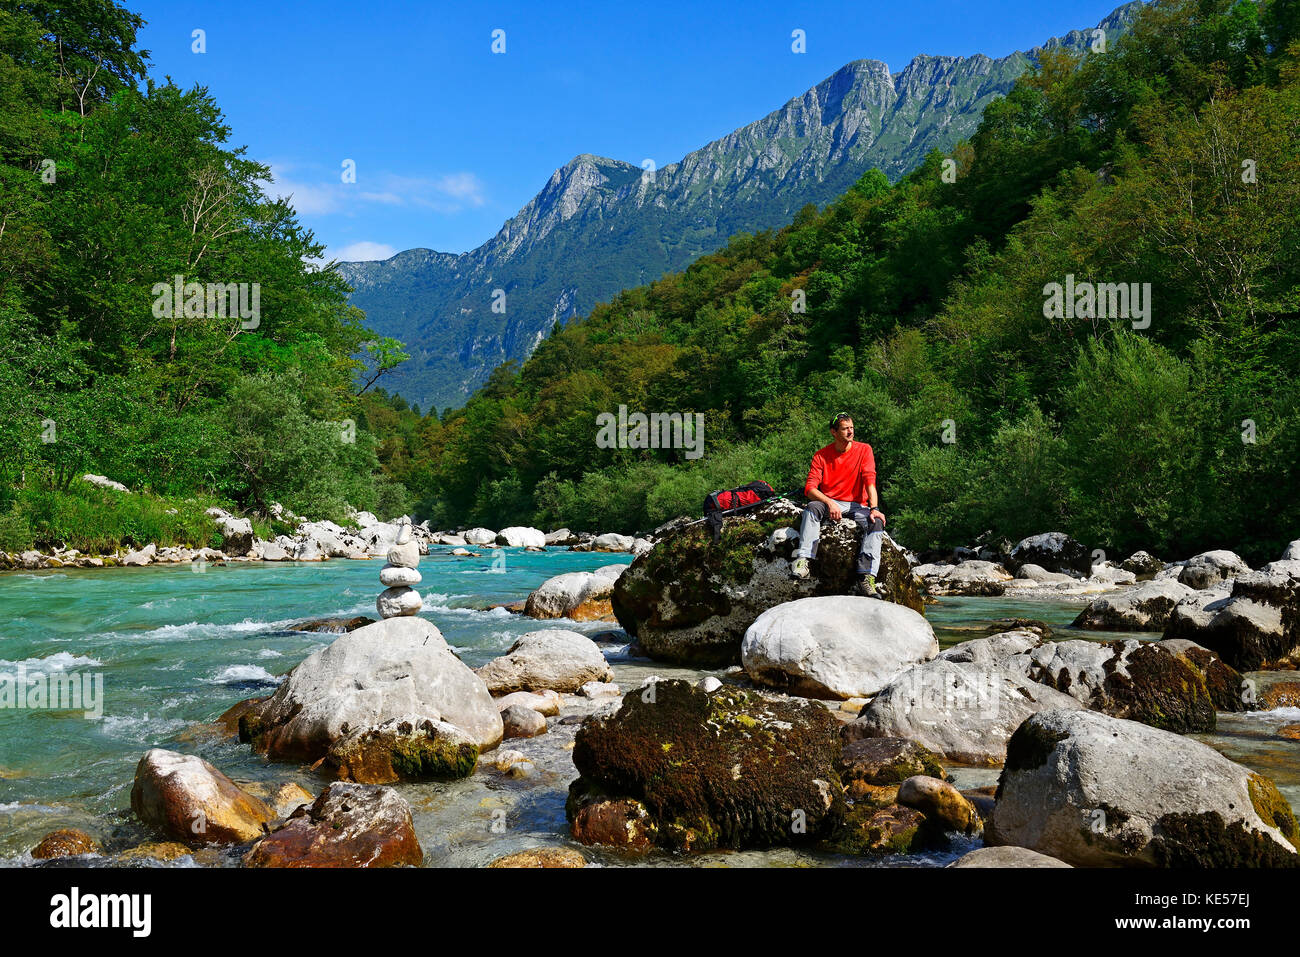 Hikers resting at the river Soca, near Kobarid, Slovenia Stock Photo